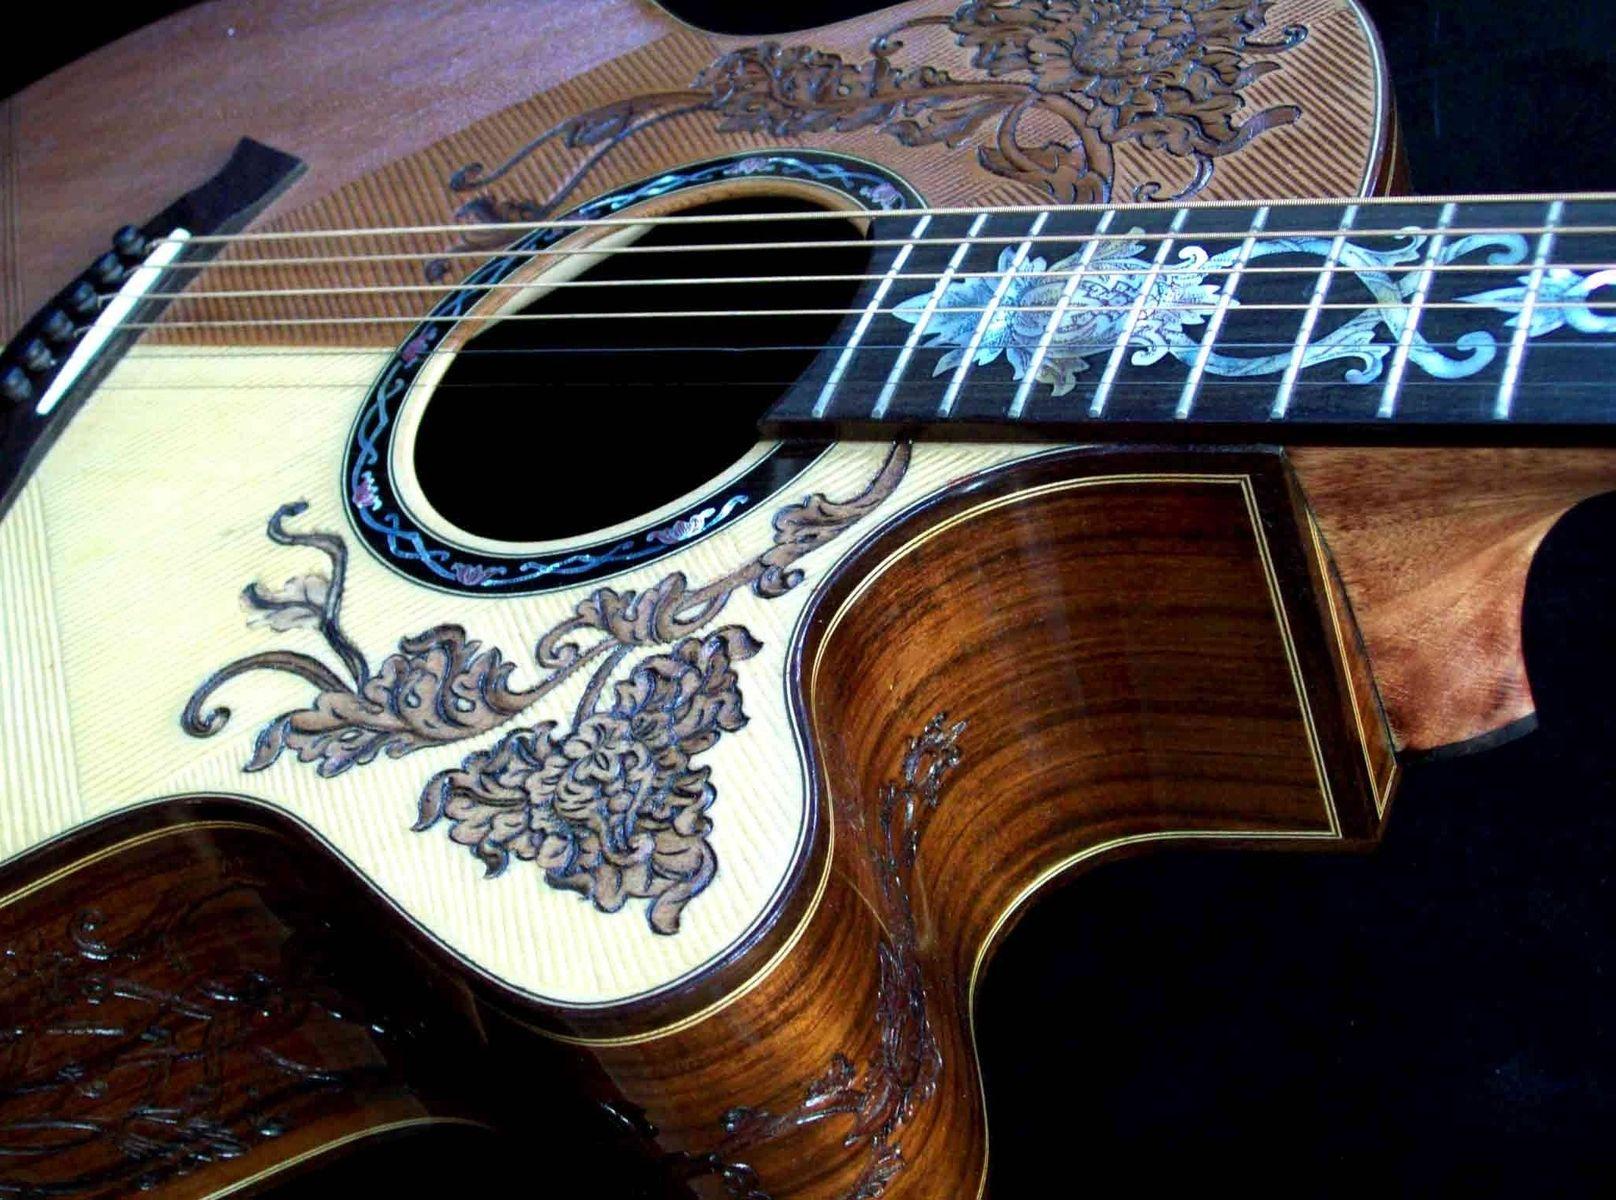 1930s Dobro Model 65 French Scroll Resonator Guitar Picker S Supply Resonator Guitar Guitar Cool Guitar